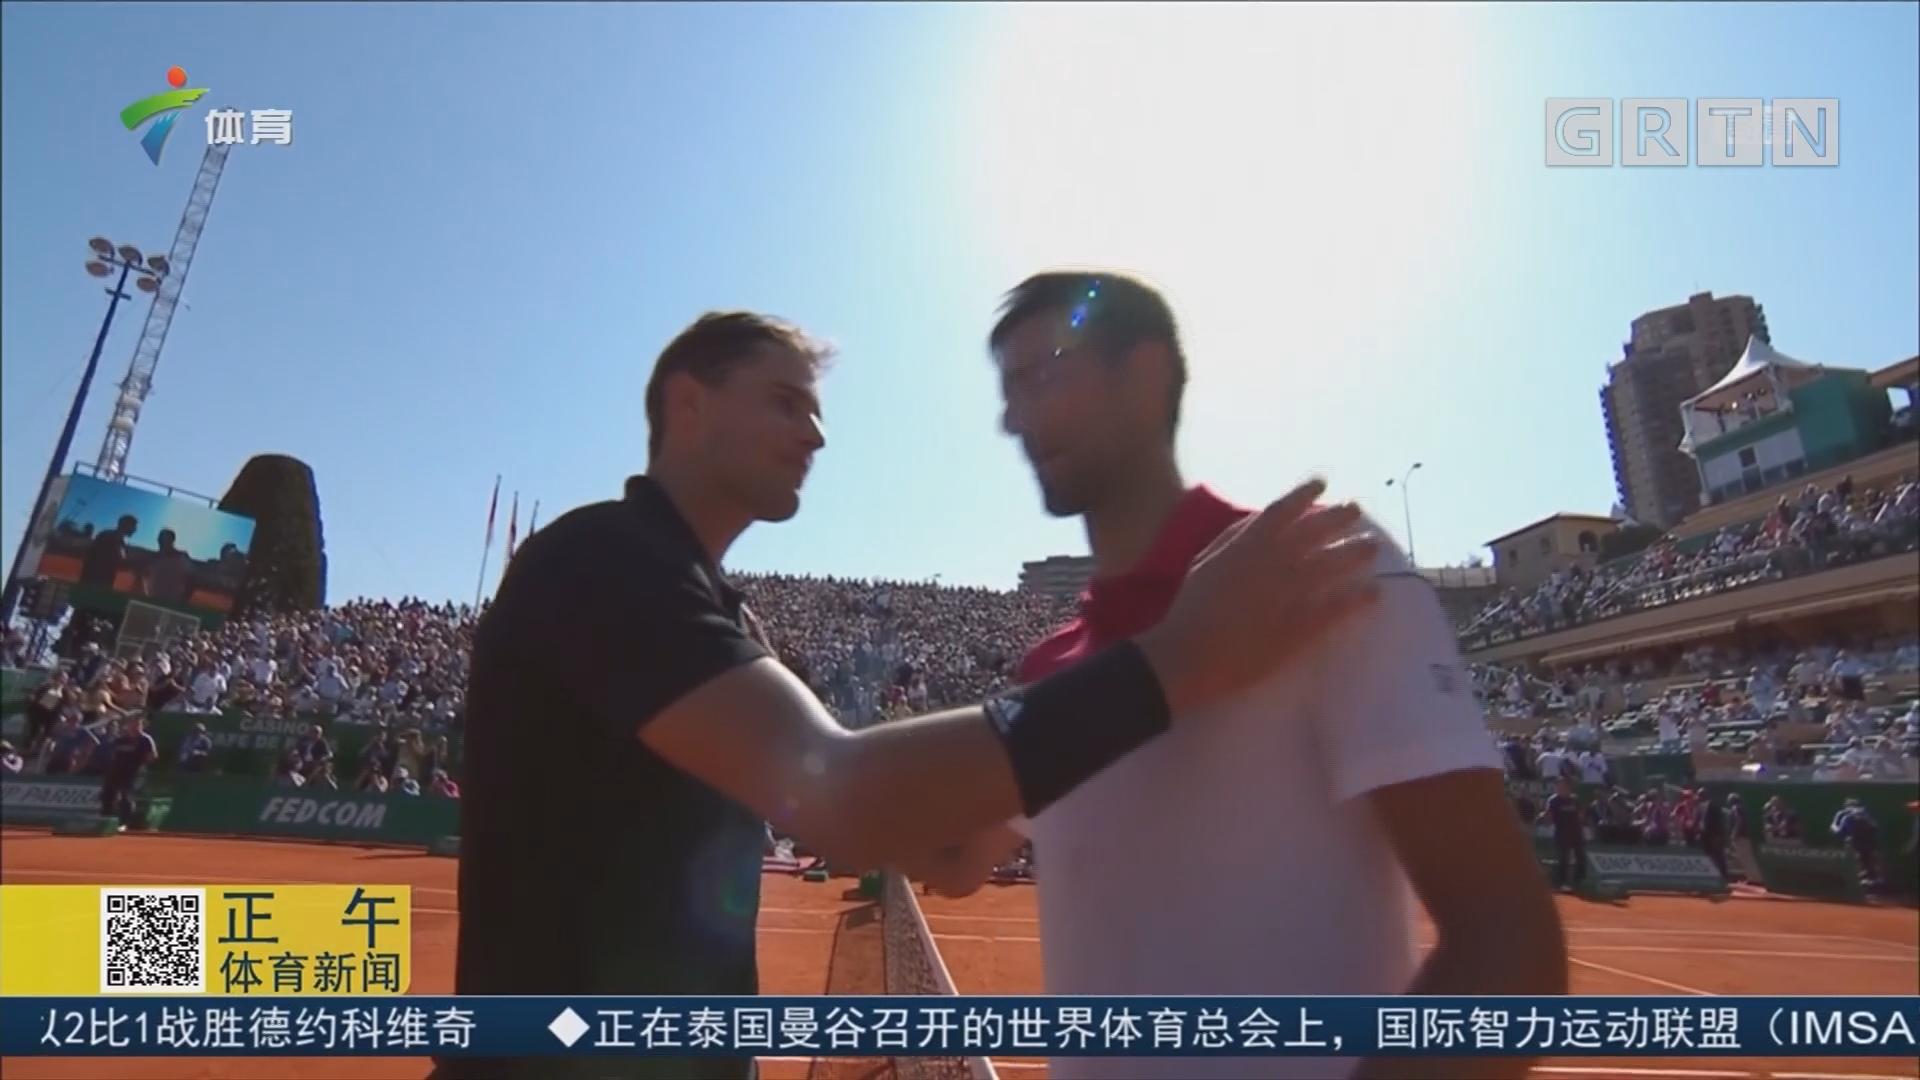 ATP蒙塔卡洛大师赛 蒂姆击败小德 将战纳达尔